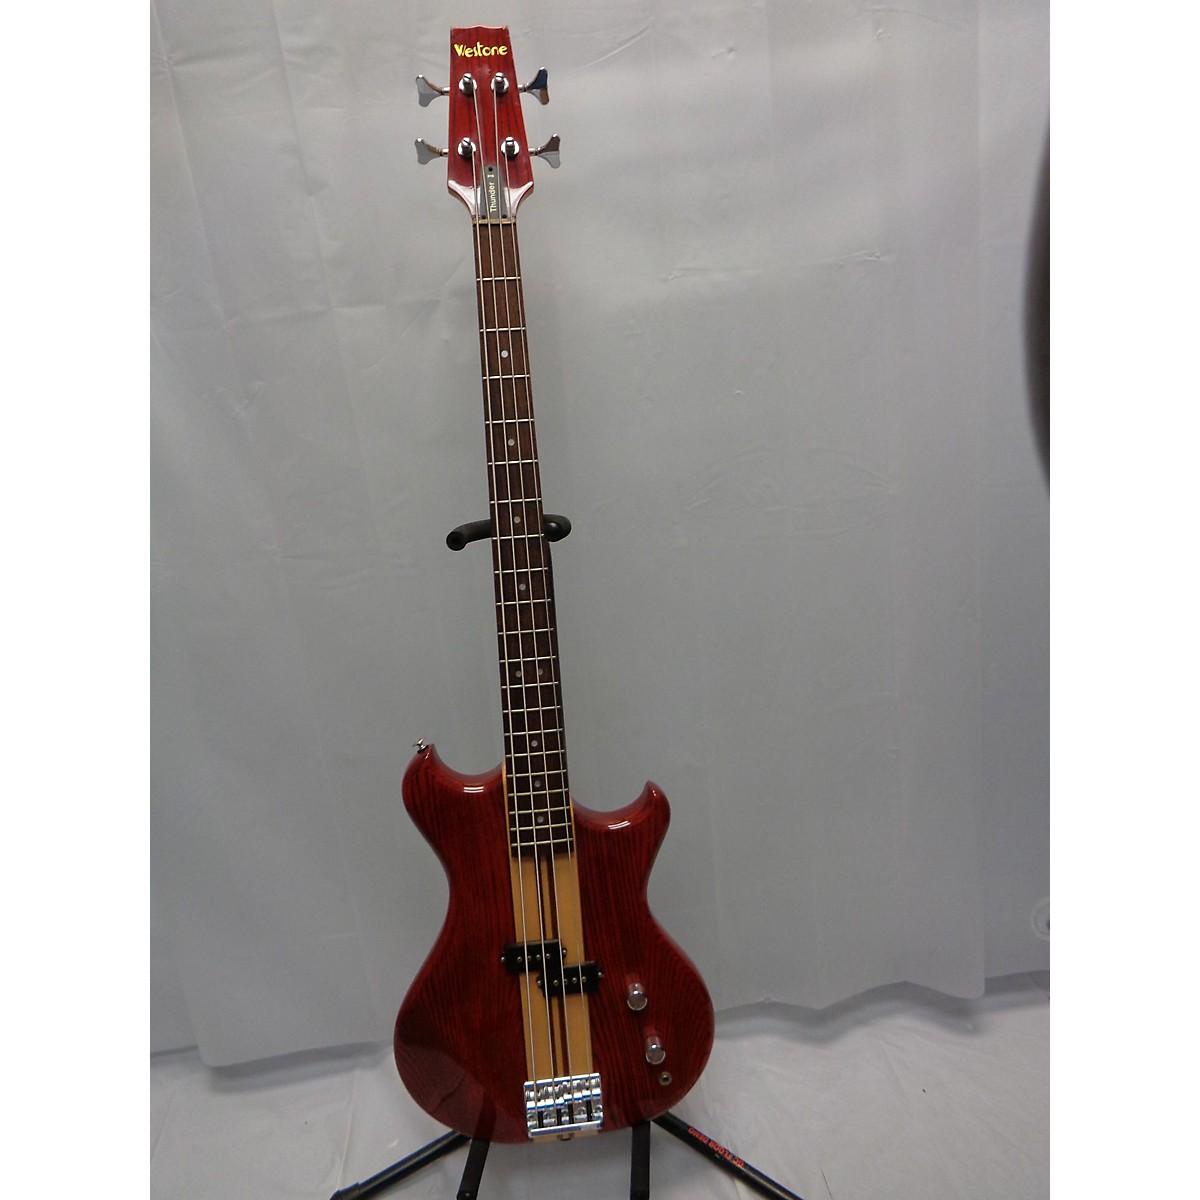 WESTONE THUNDER I Electric Bass Guitar